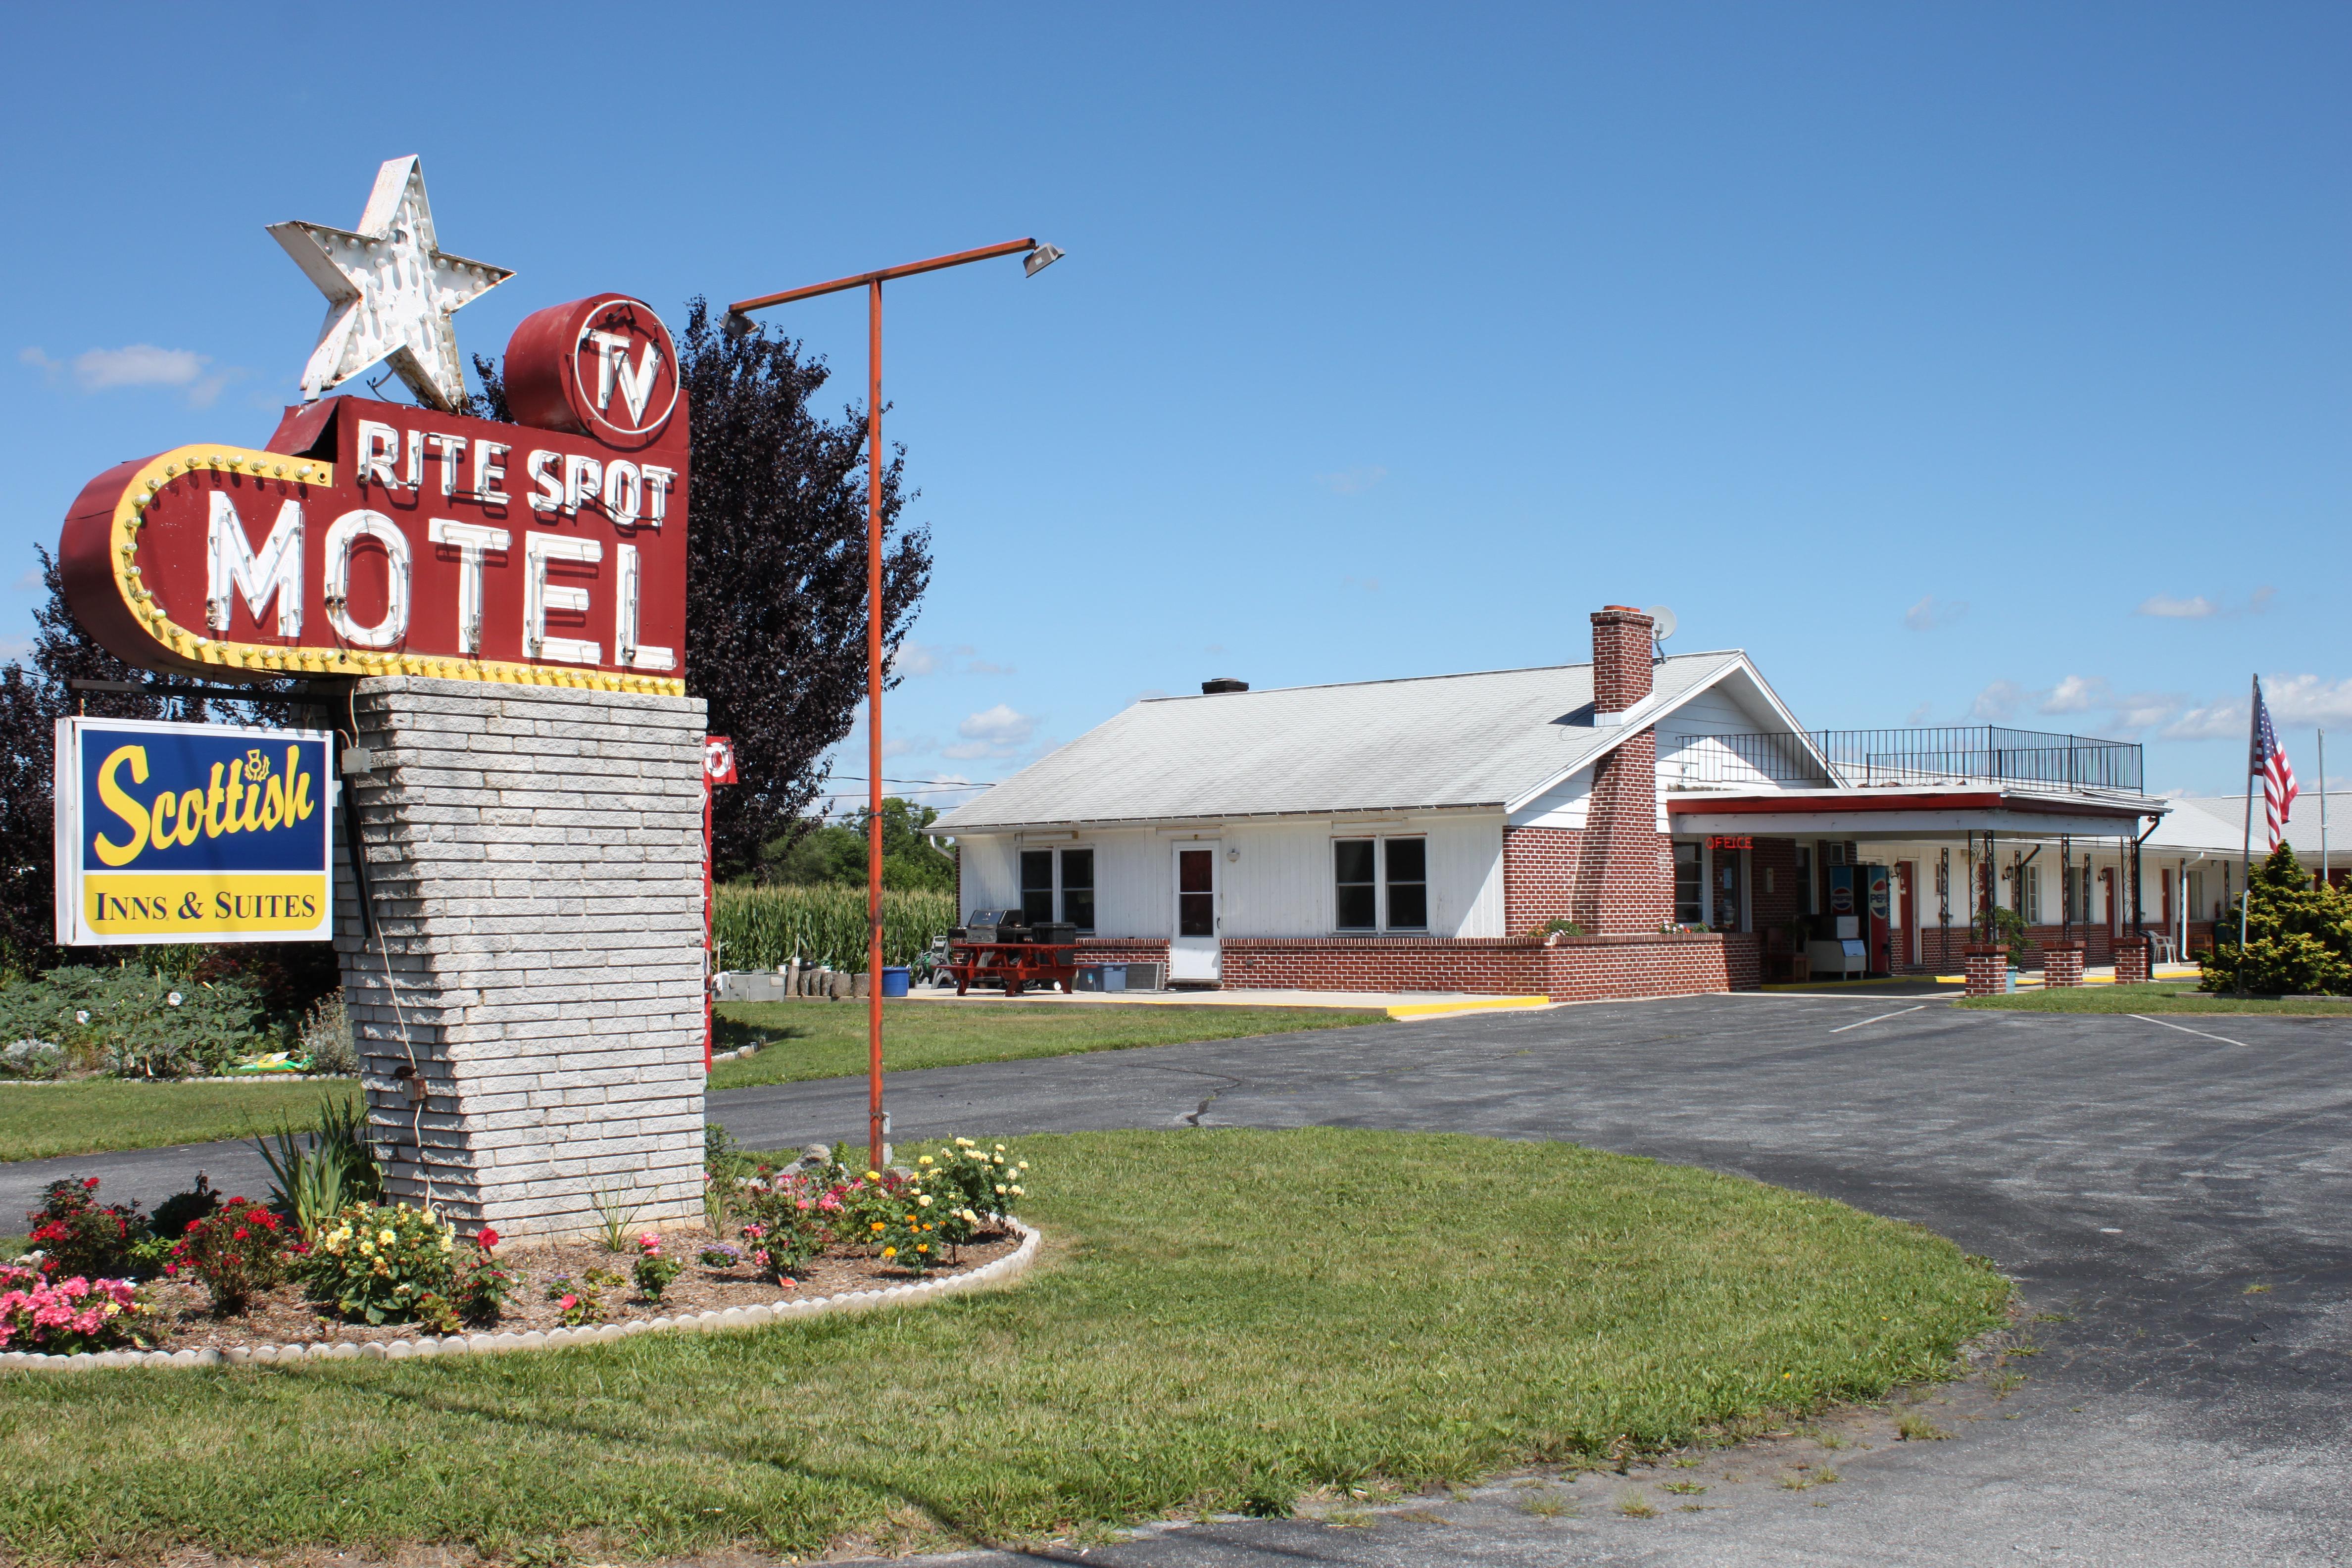 Rite Spot Motel - 5651 Lincoln Way East, Fayetteville, Pennsylvania U.S.A. - July 29, 2013